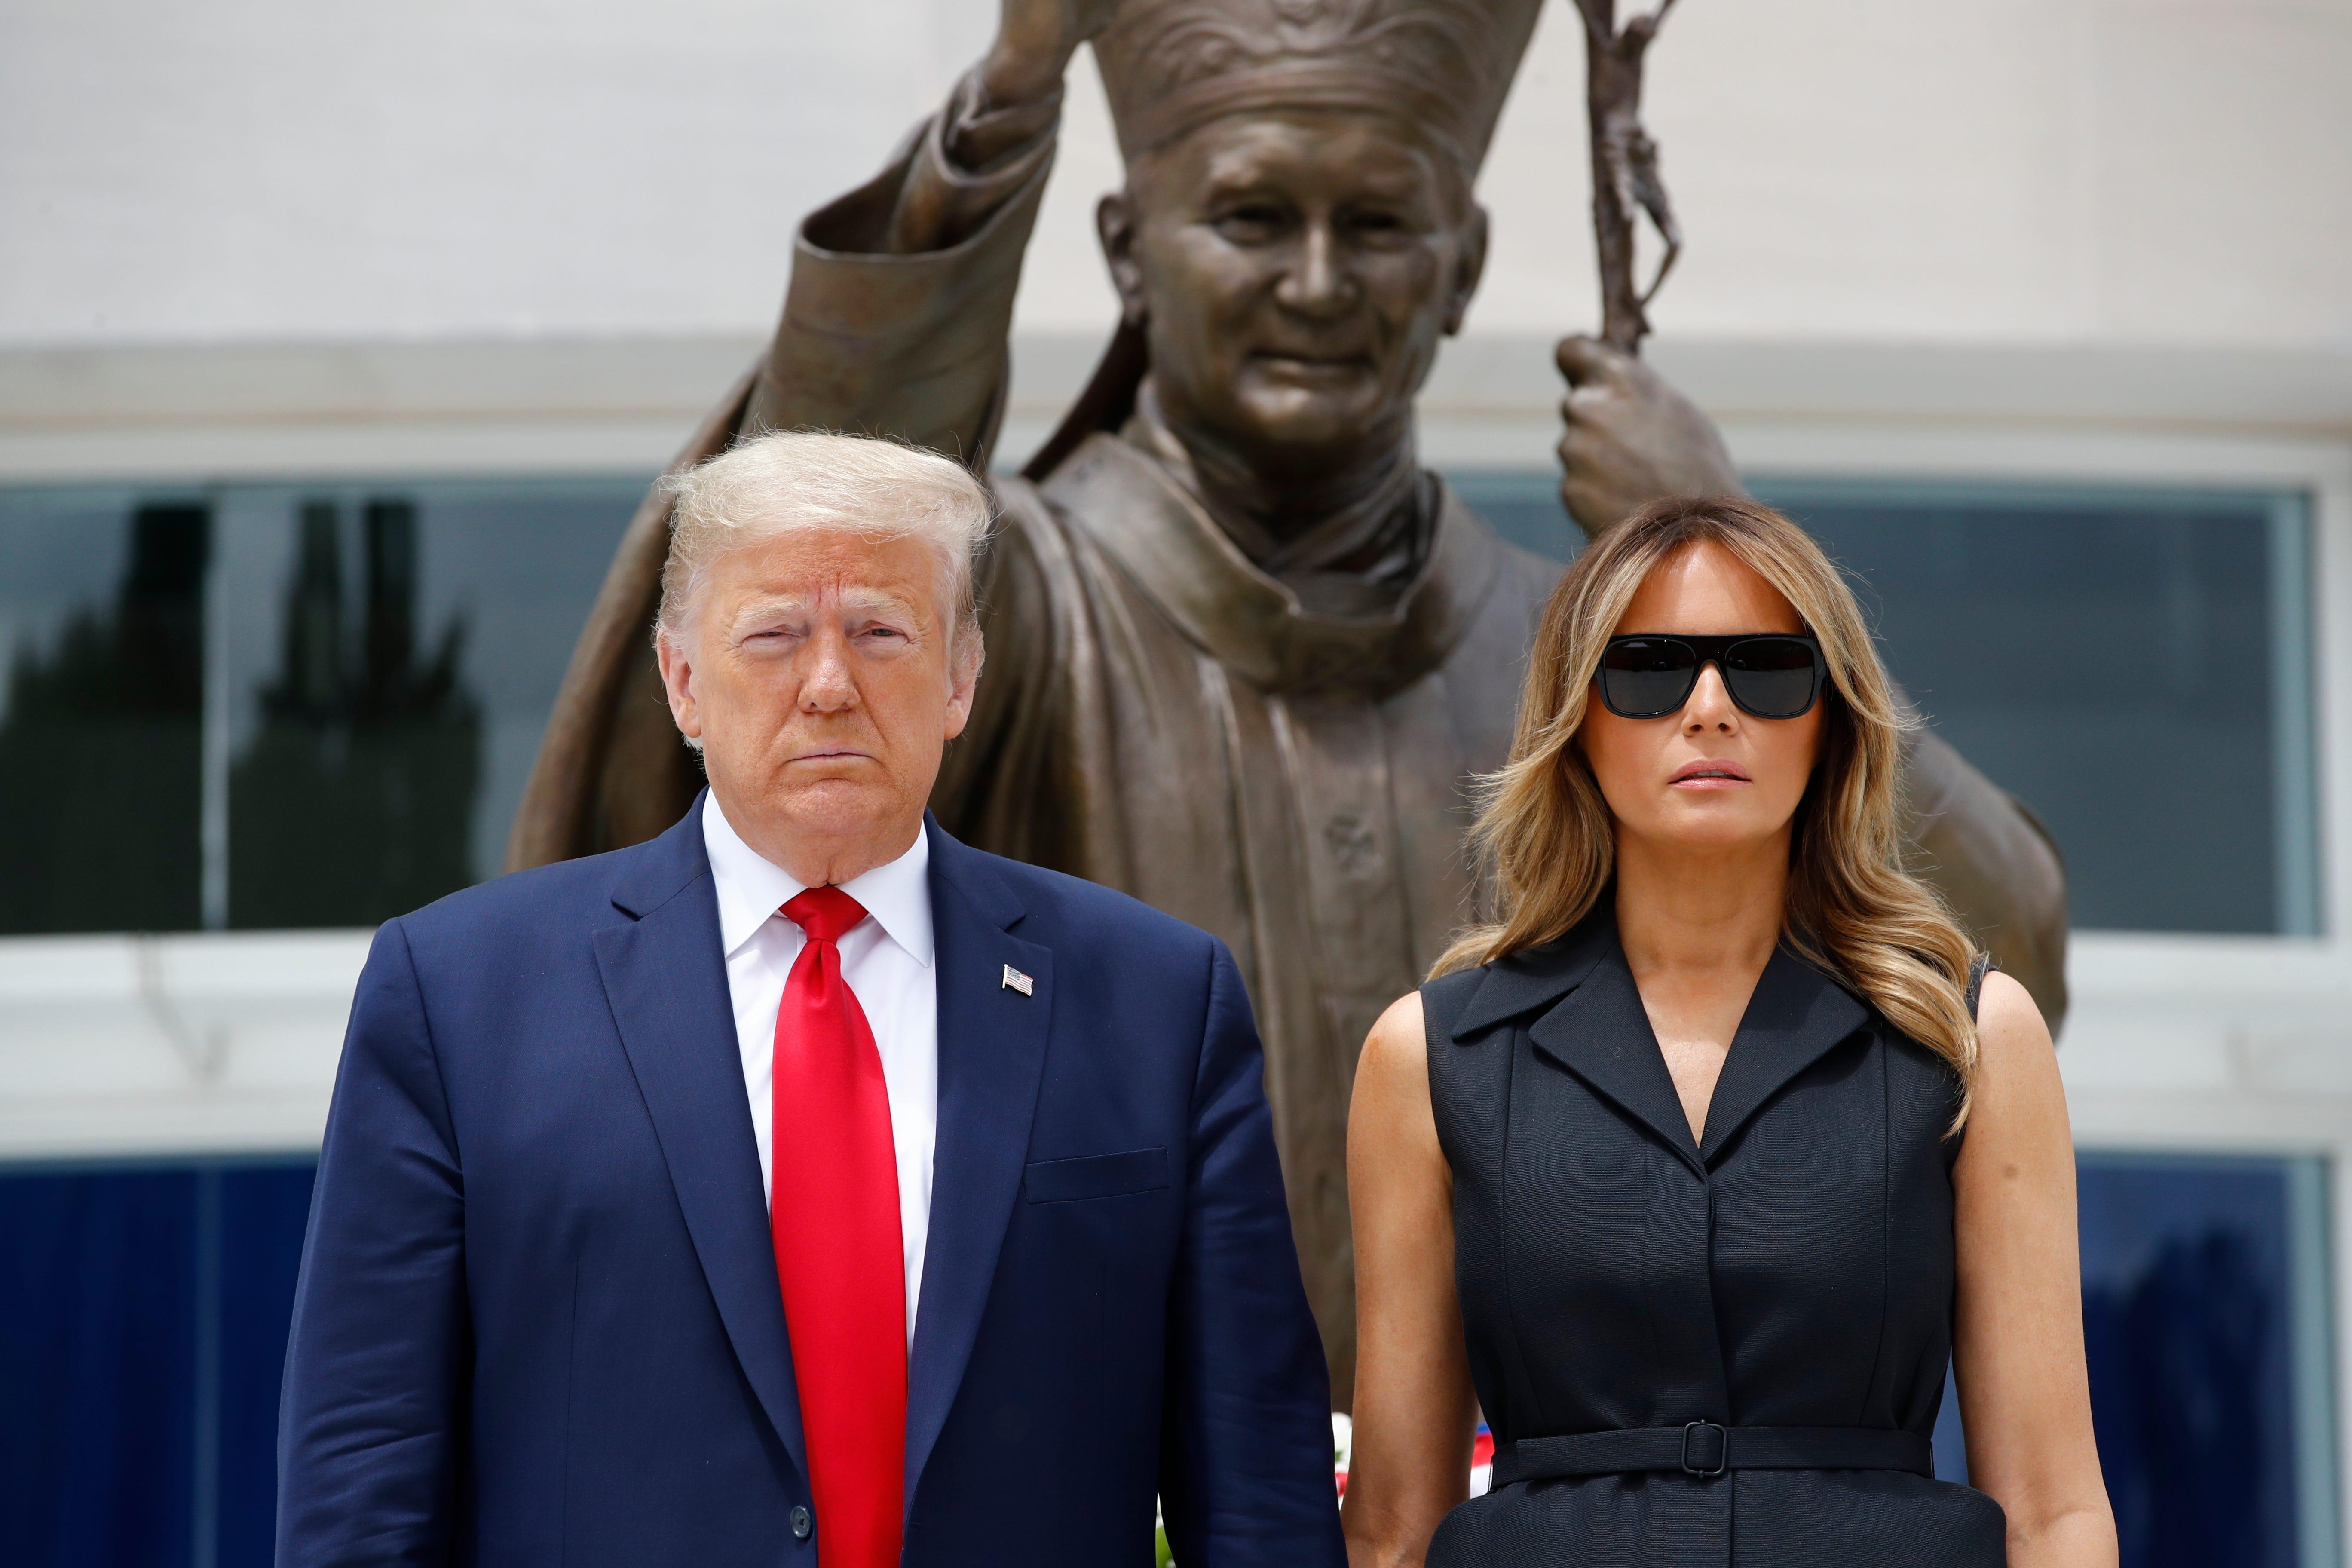 Wash Dc Shrine 2020 Christmas Concert George Floyd: Trump visits Catholic shrine amid 'photo op' criticism